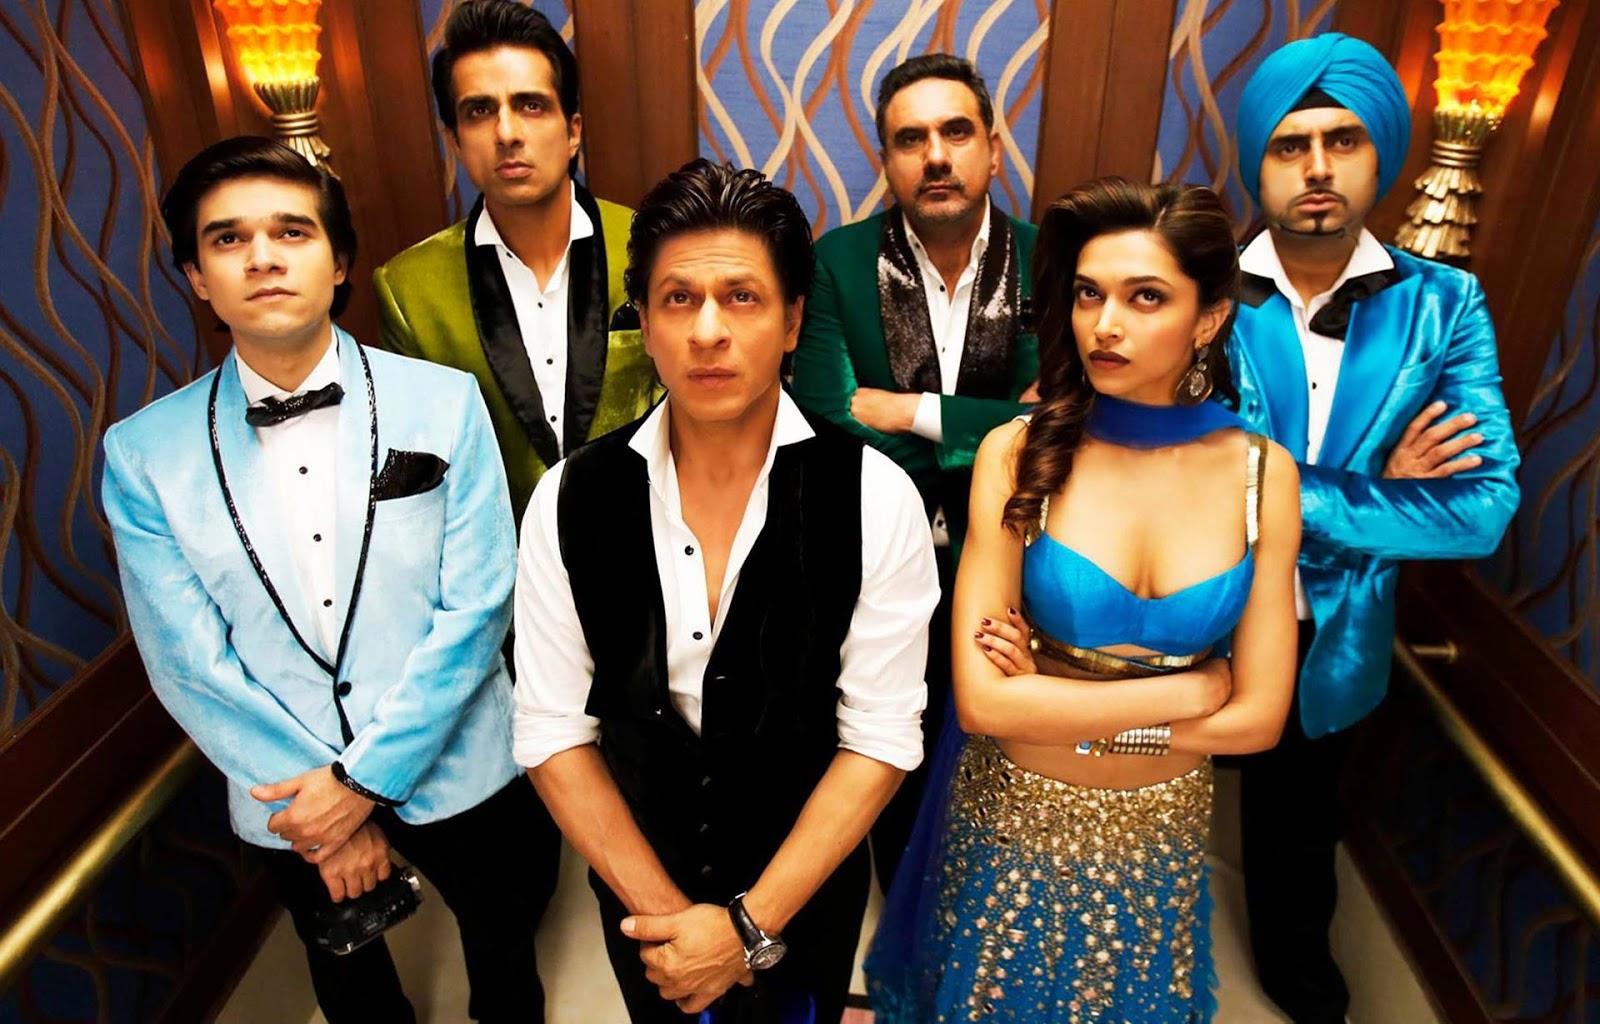 happy new year the ensemble cast shahrukh khan deepika padukone boman irani